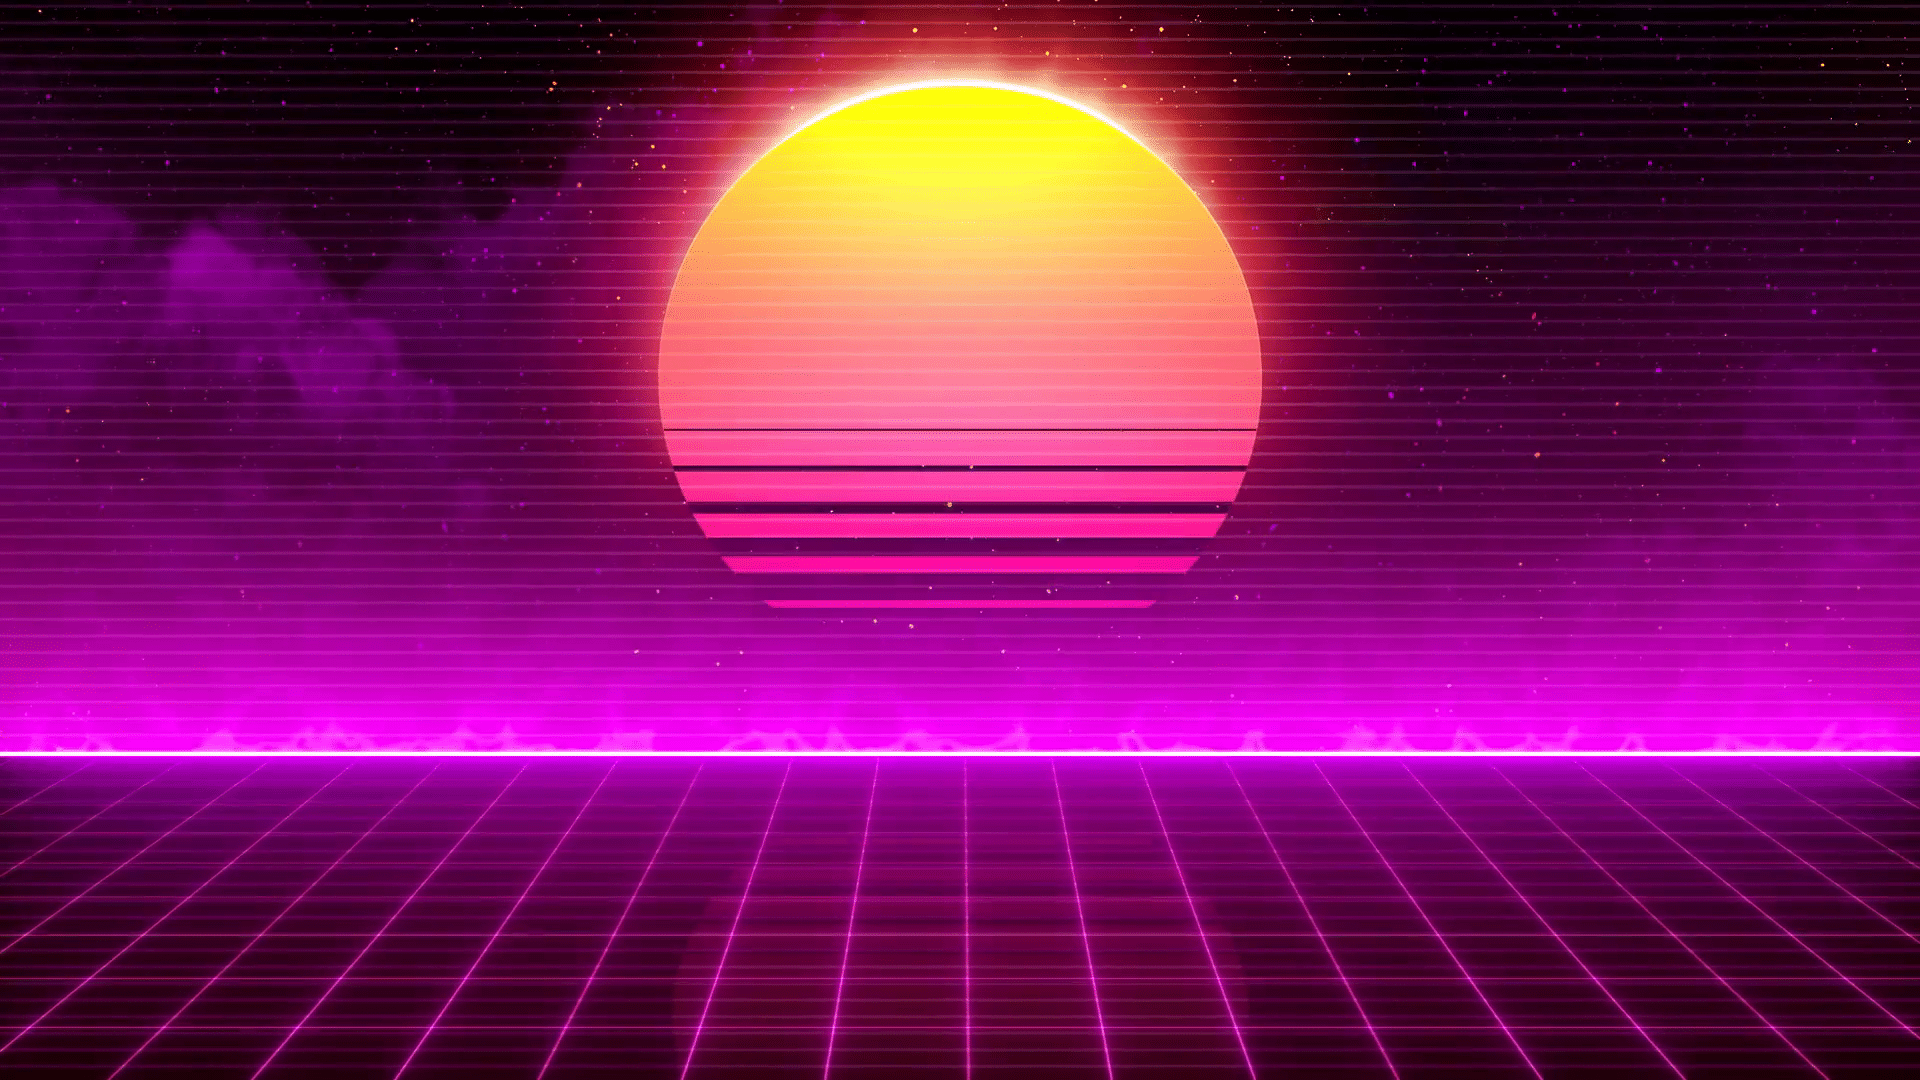 Neon Glow Effect using CSS